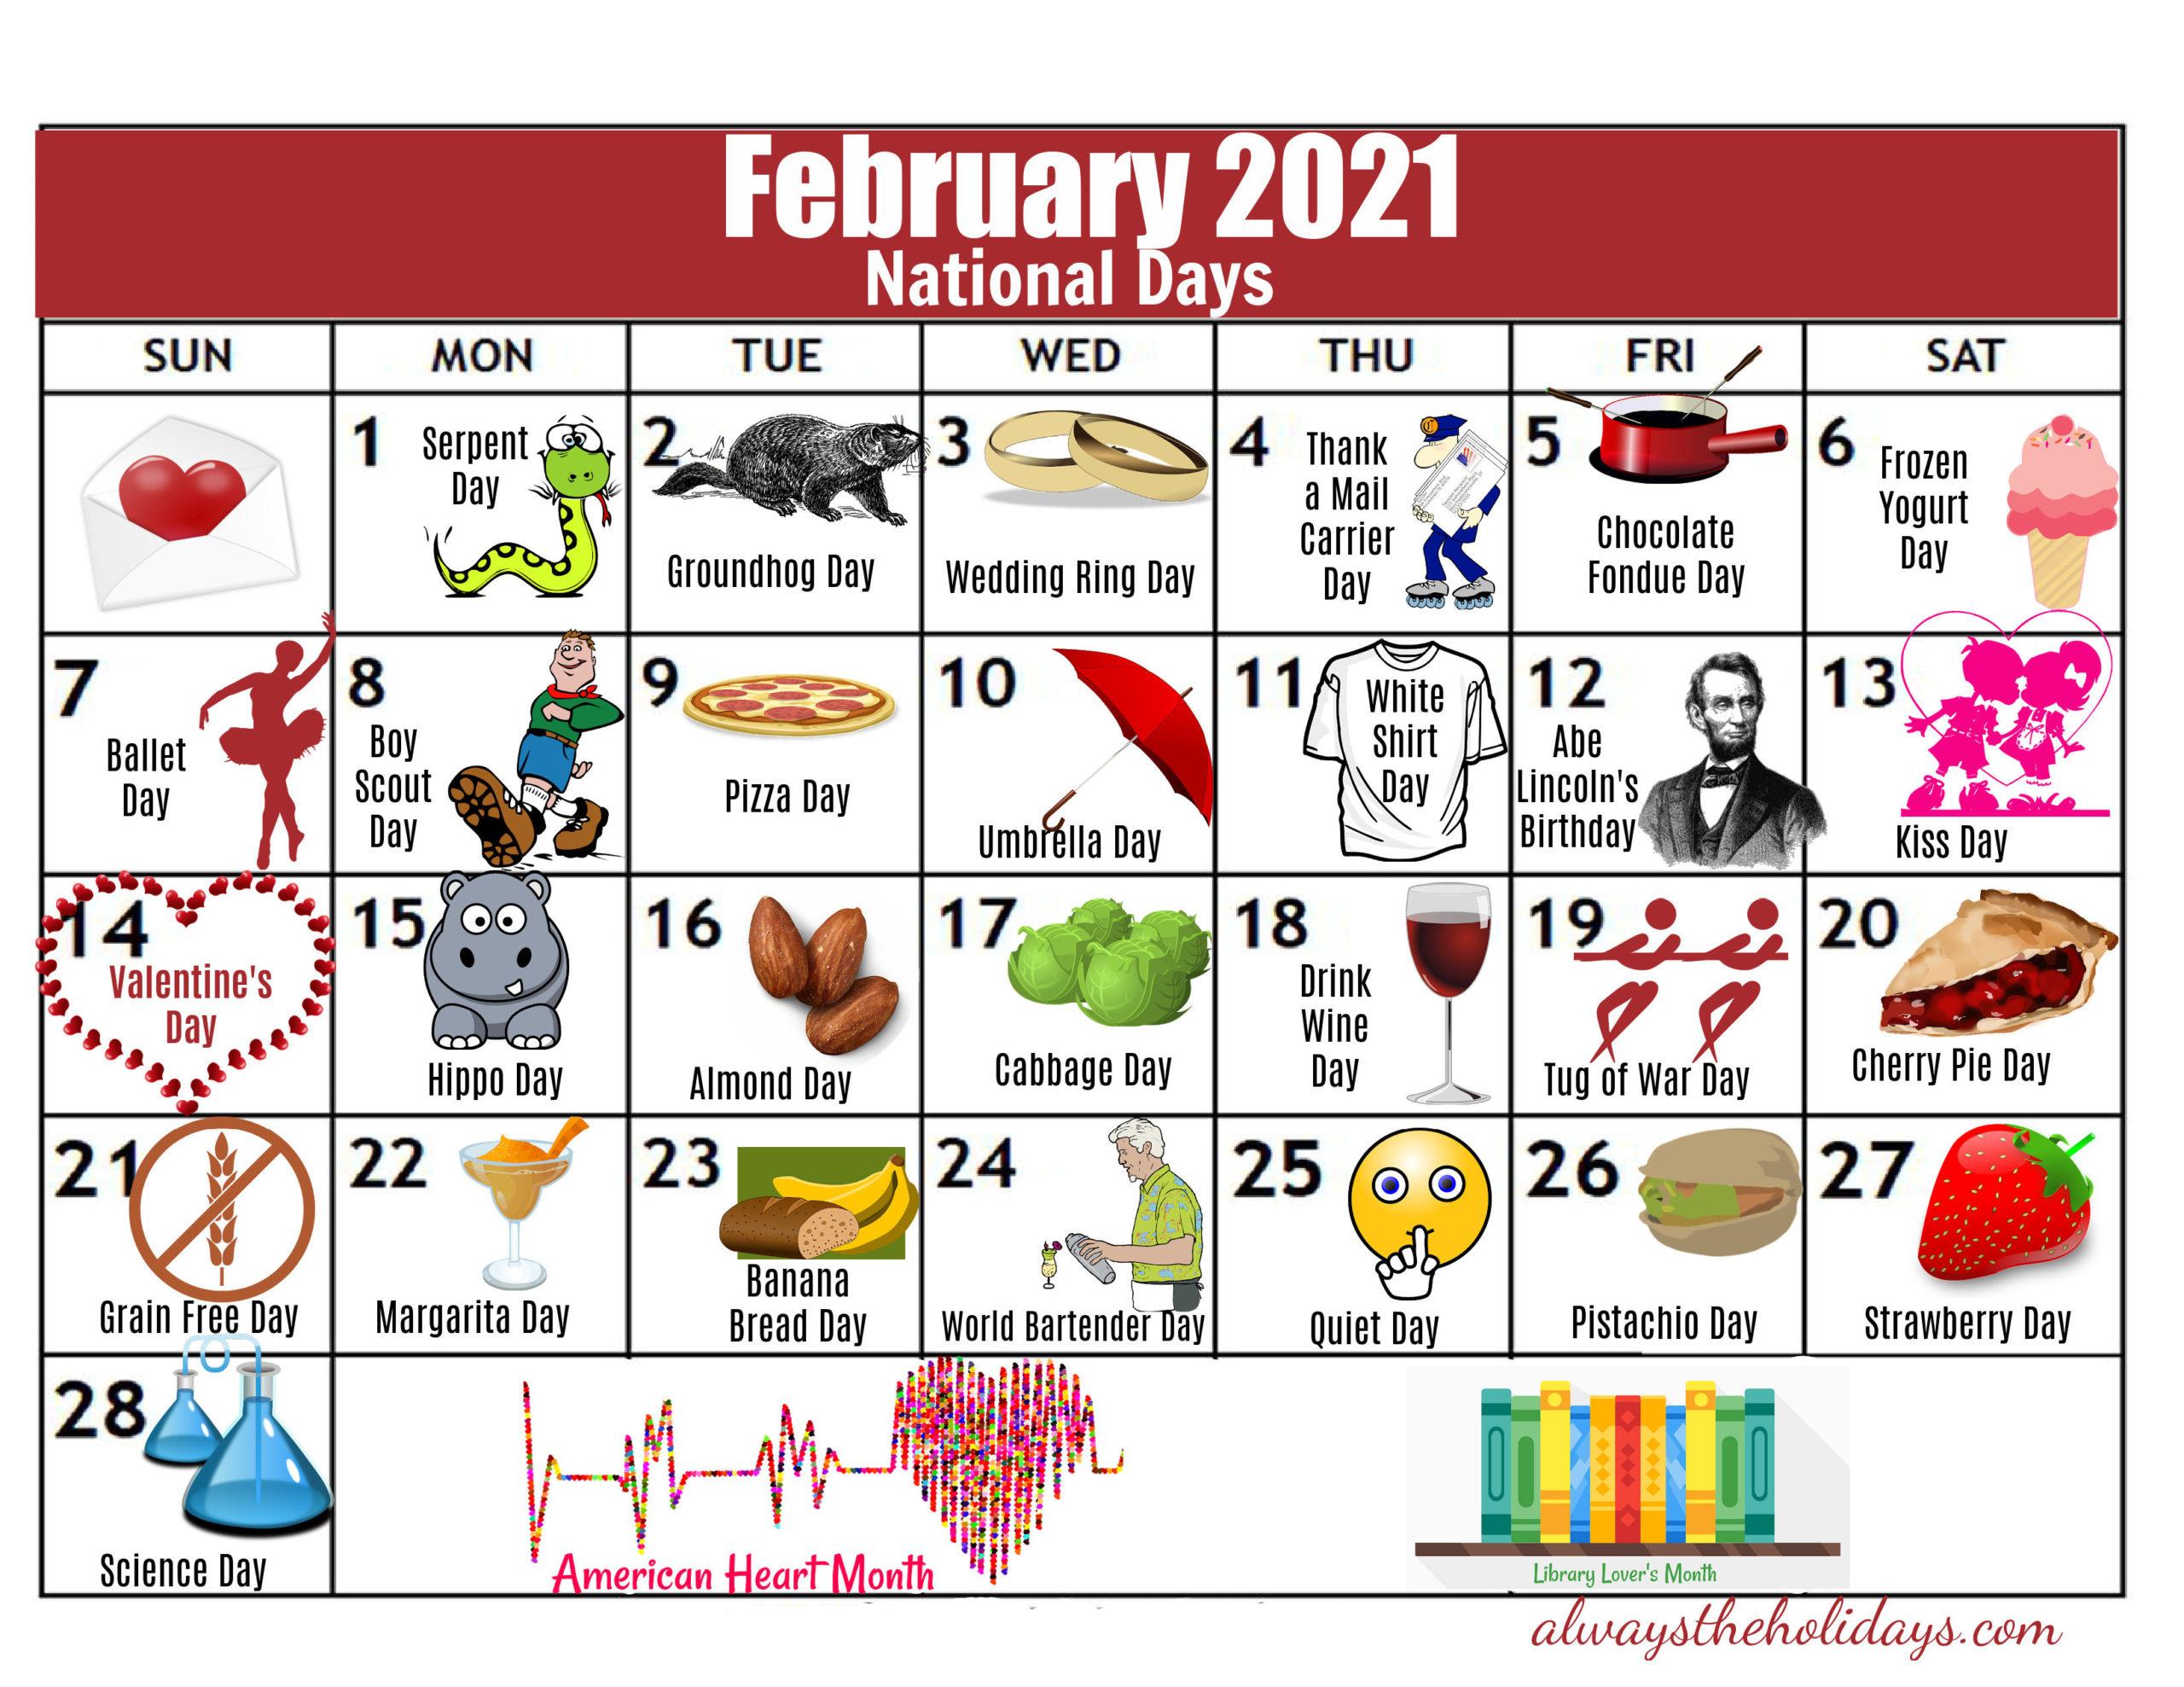 February National Day Calendar - 2021 Free Printable Calendars